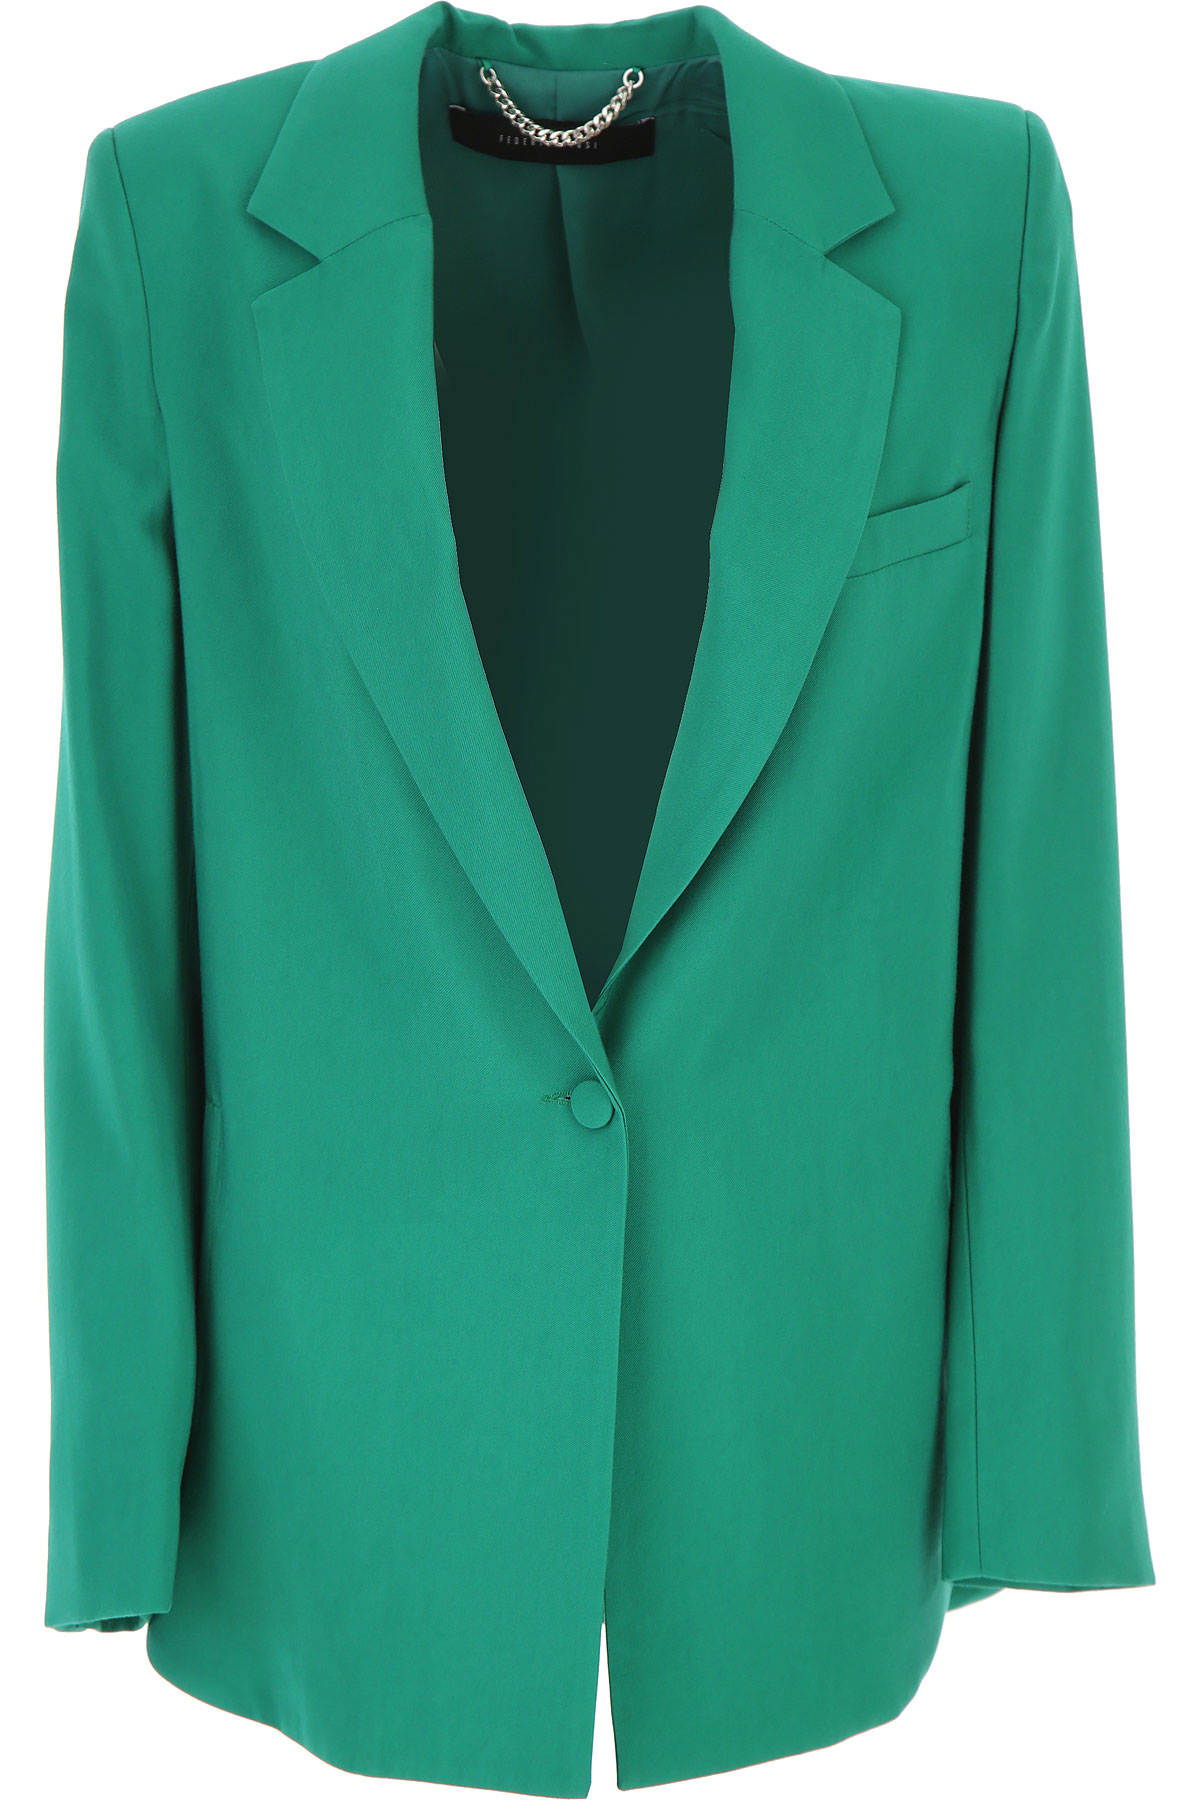 Federica Tosi Blazer for Women On Sale, Green, viscosa, 2019, 2 4 8